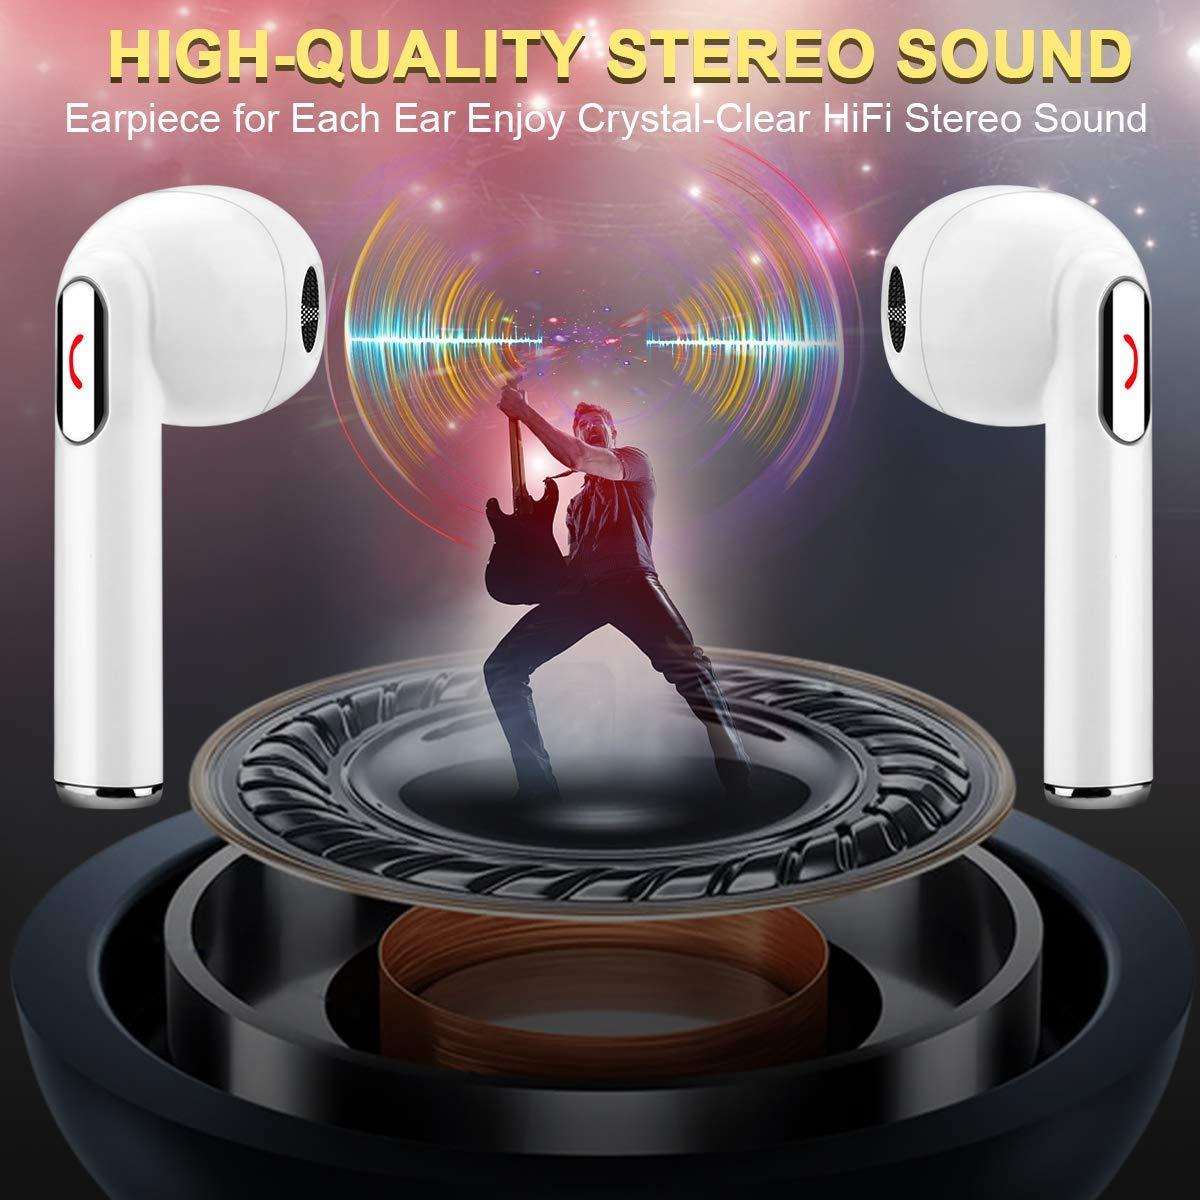 TAKTOP Wireless Earbuds Stereo Bluetooth Headphones with Charging Case Mini in-Ear Earphones Built-in Mic Noise Canceling Sweatproof Sports Wireless Headphone Bluetooth Earbud White